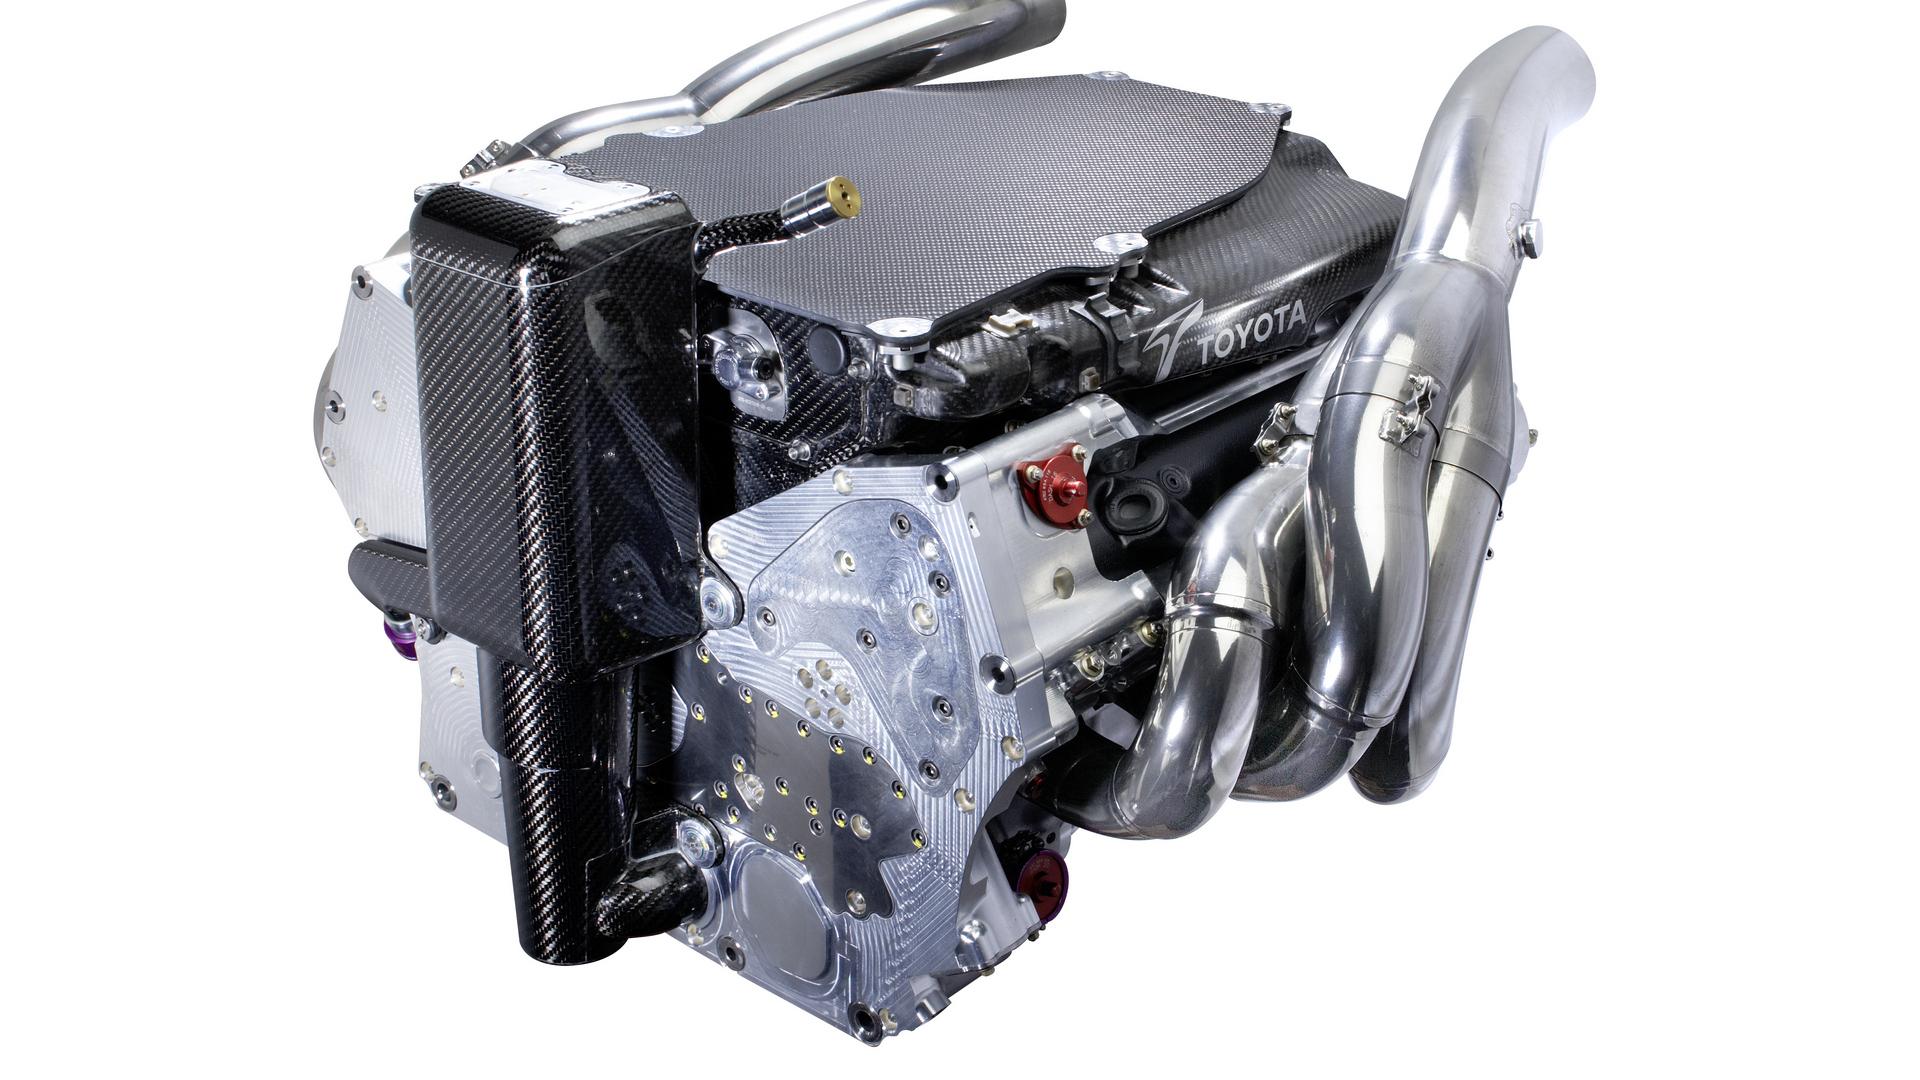 f1 engine wallpaper - photo #21